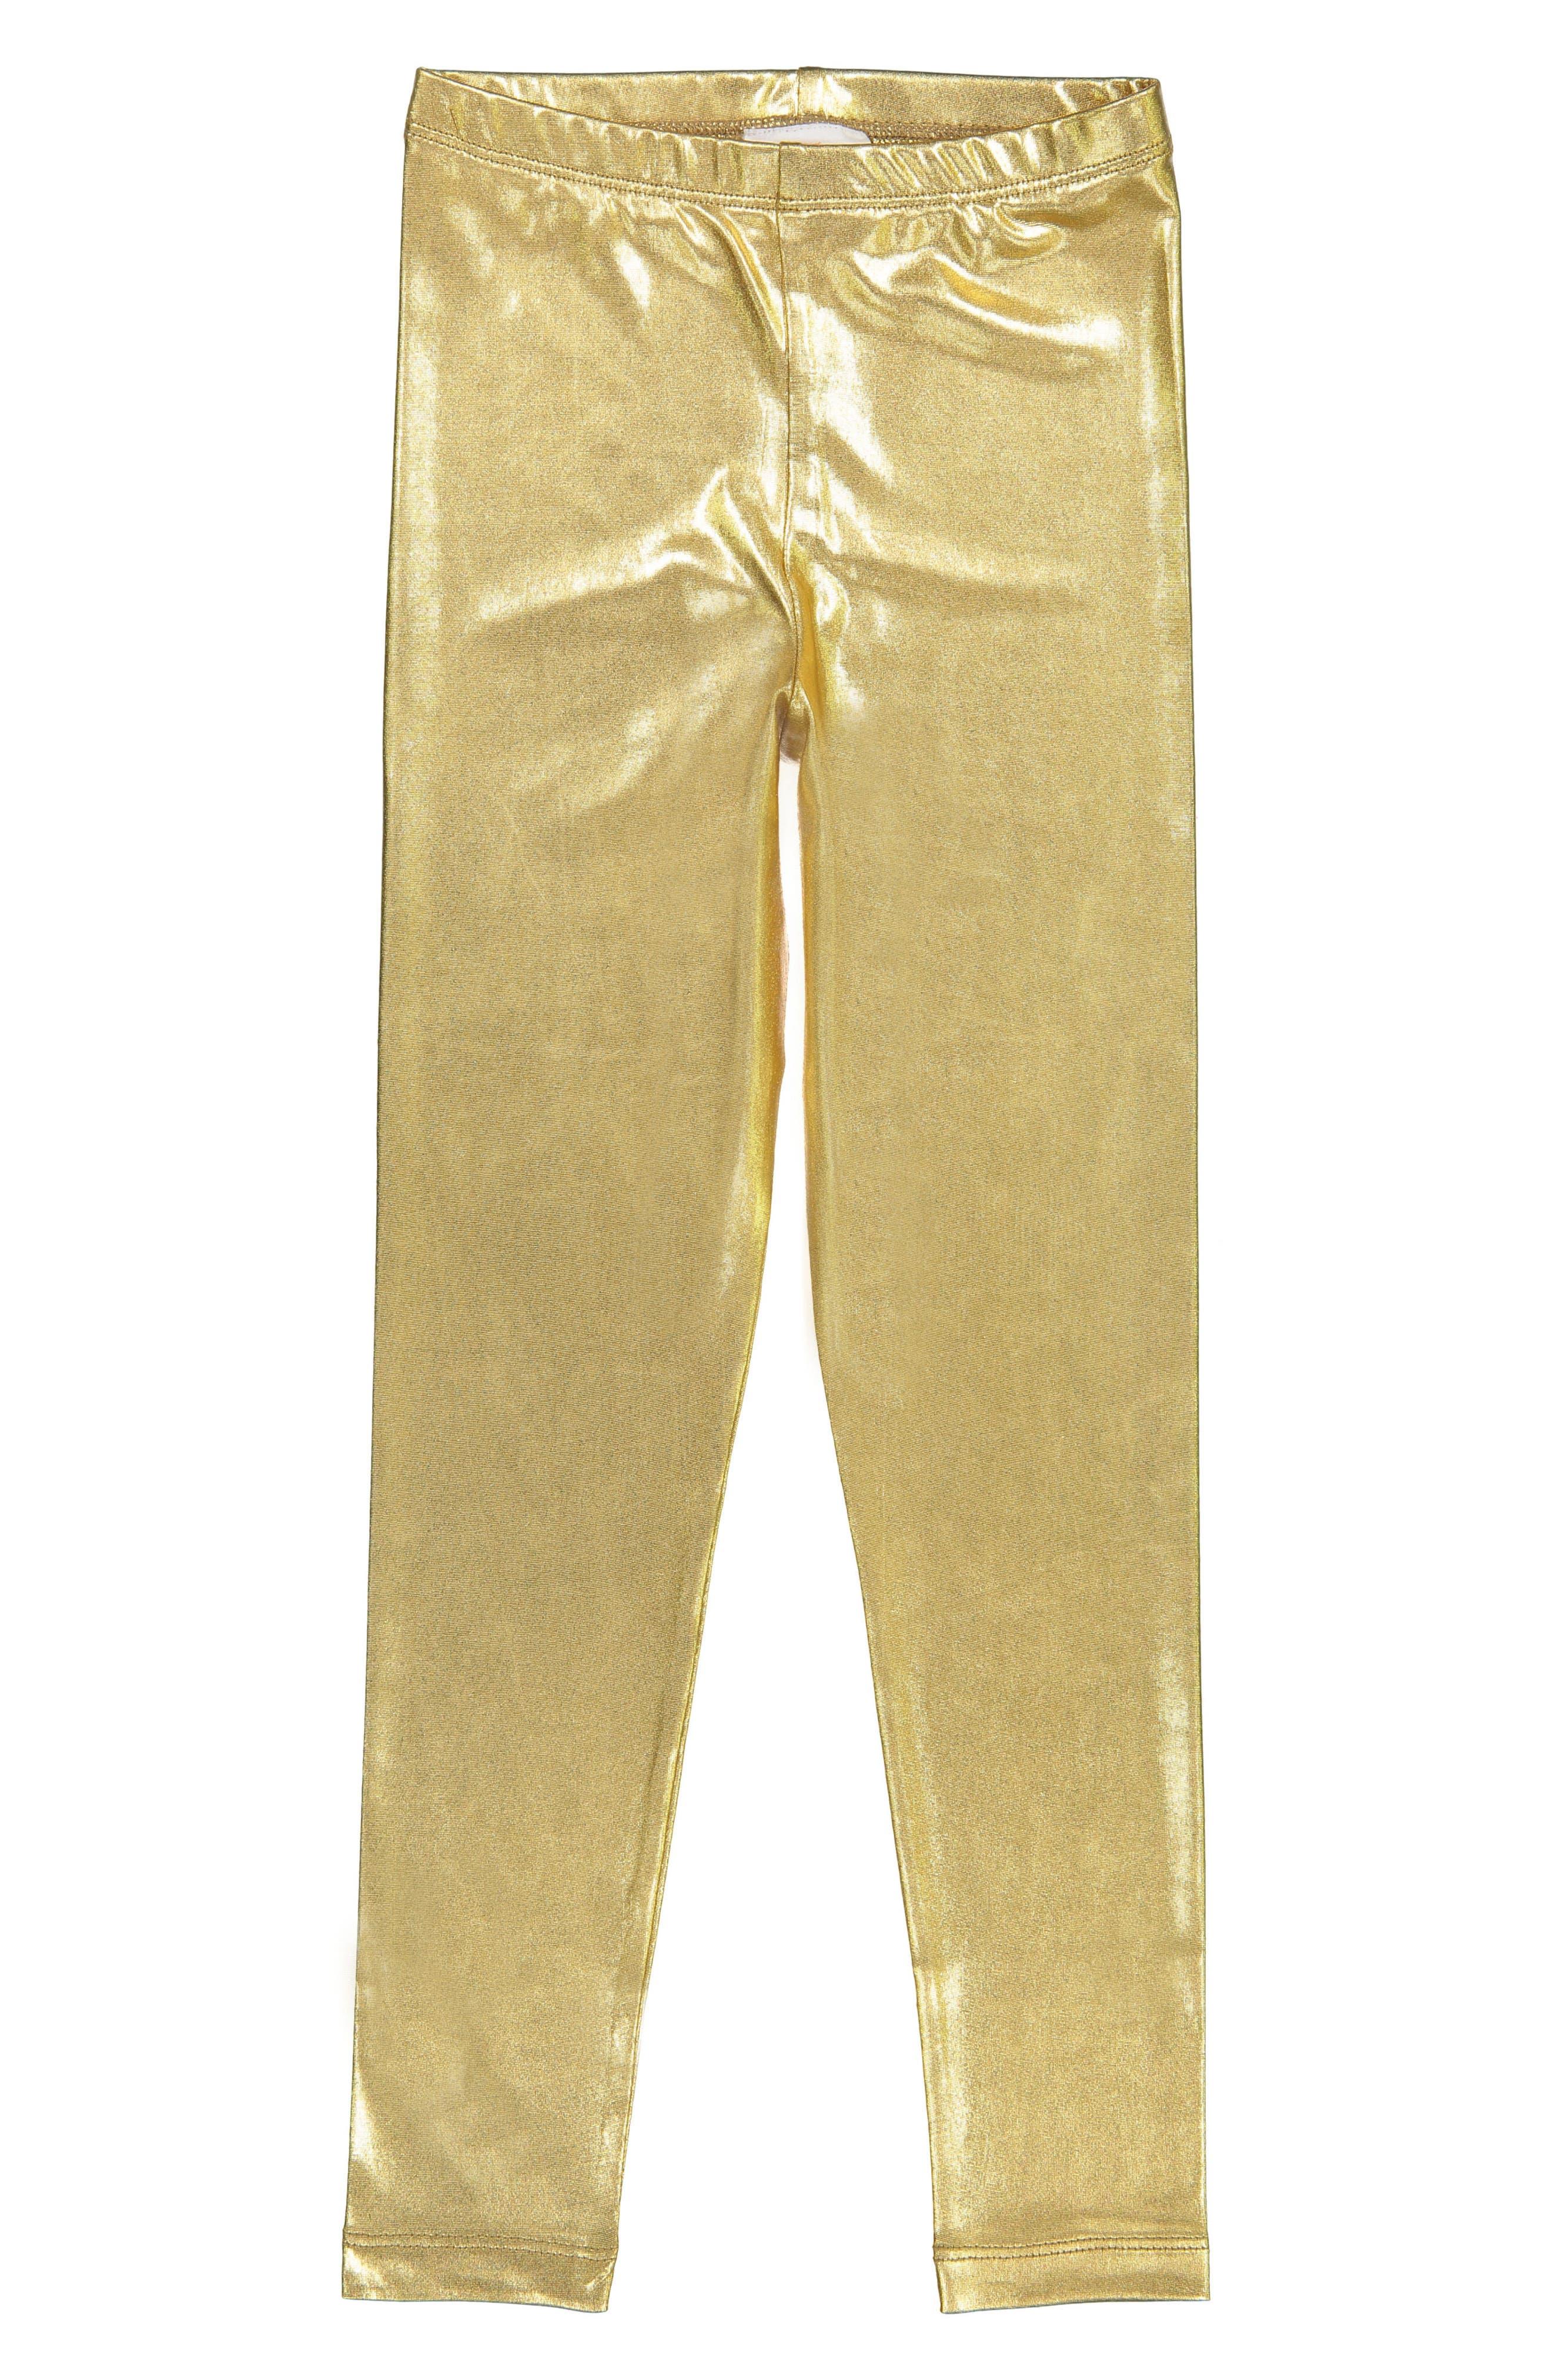 Gold Metallic Leggings,                             Main thumbnail 1, color,                             710